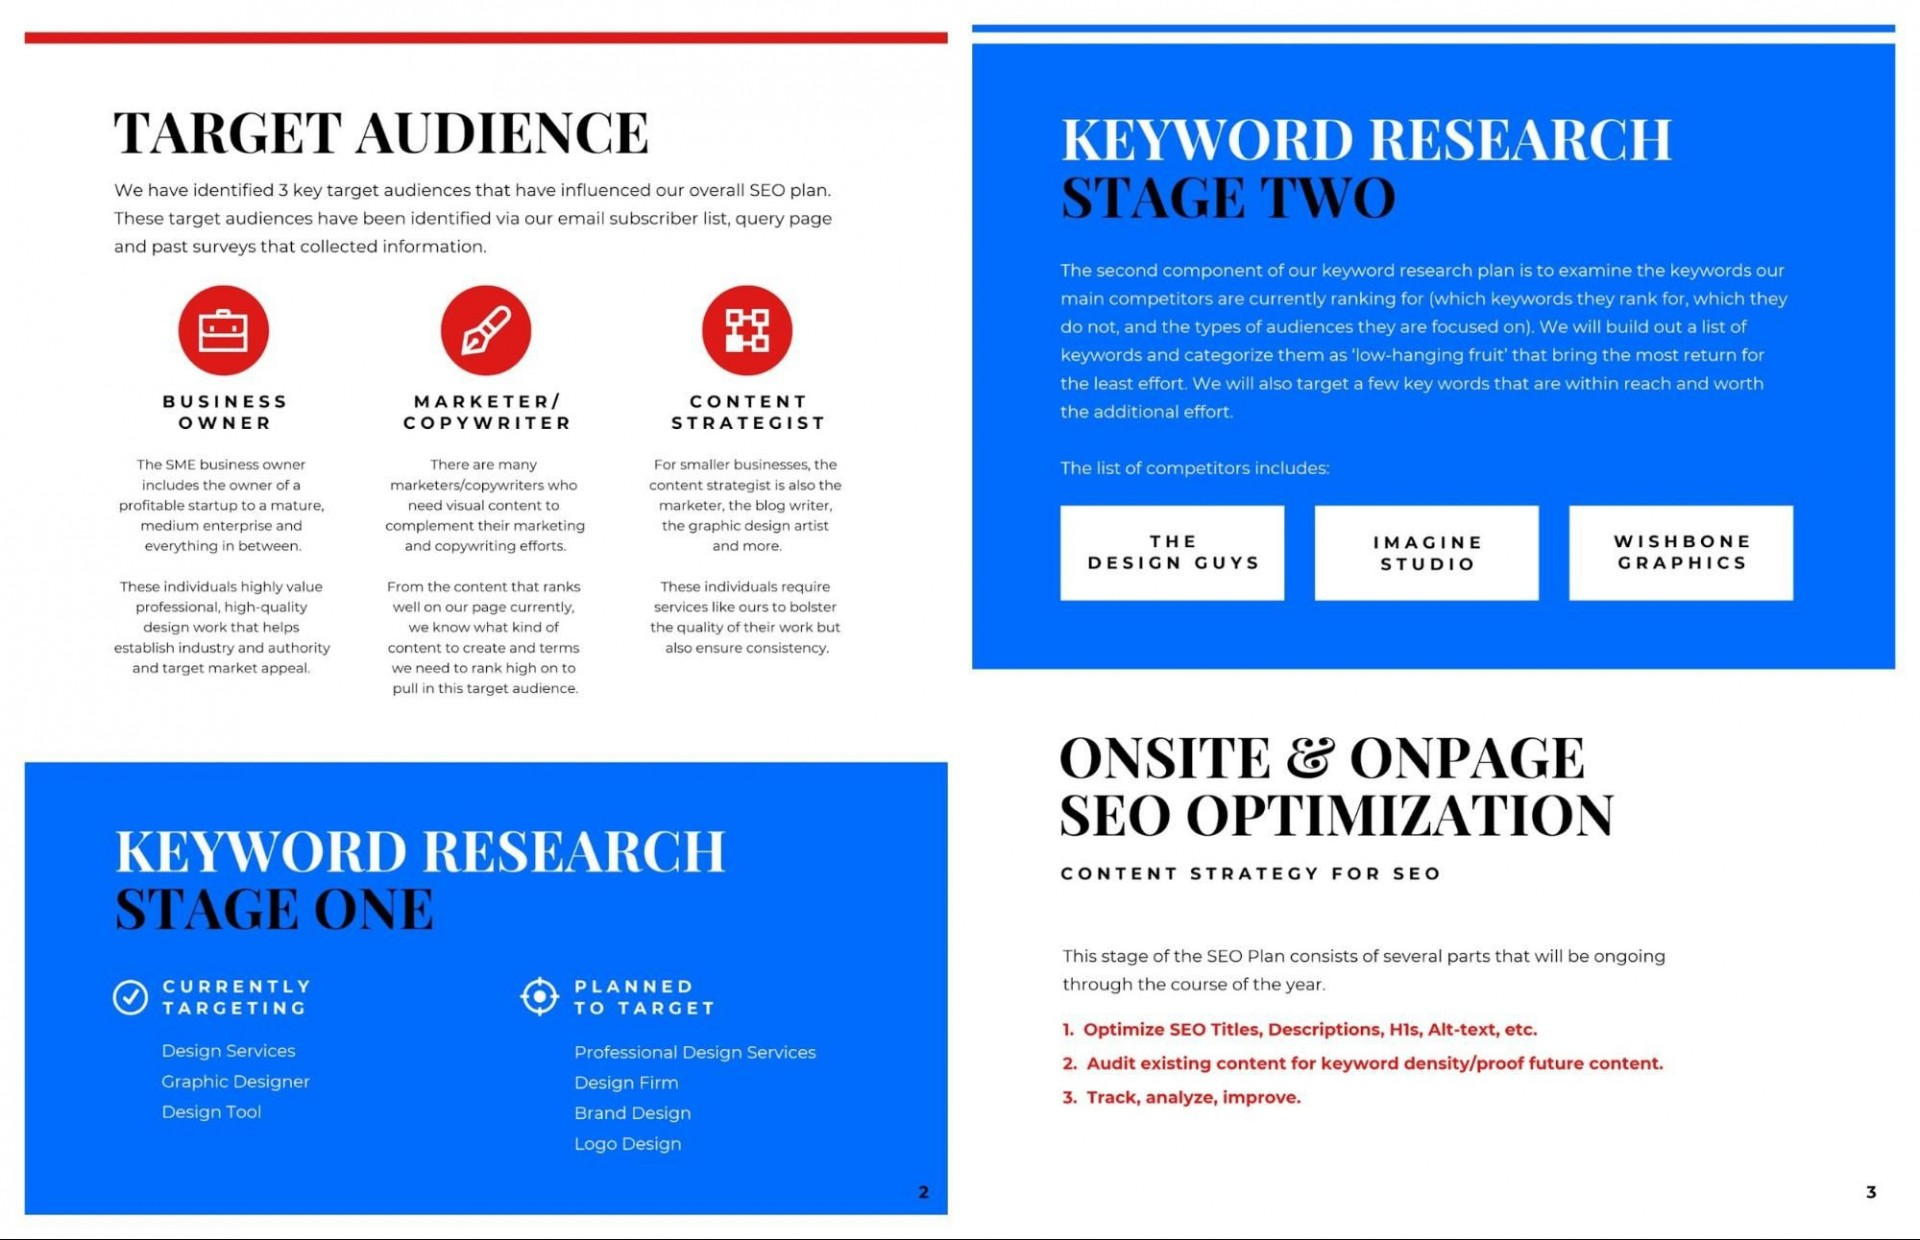 003 Phenomenal Digital Marketing Plan Example Pdf Inspiration  Free Template Busines Sample1920